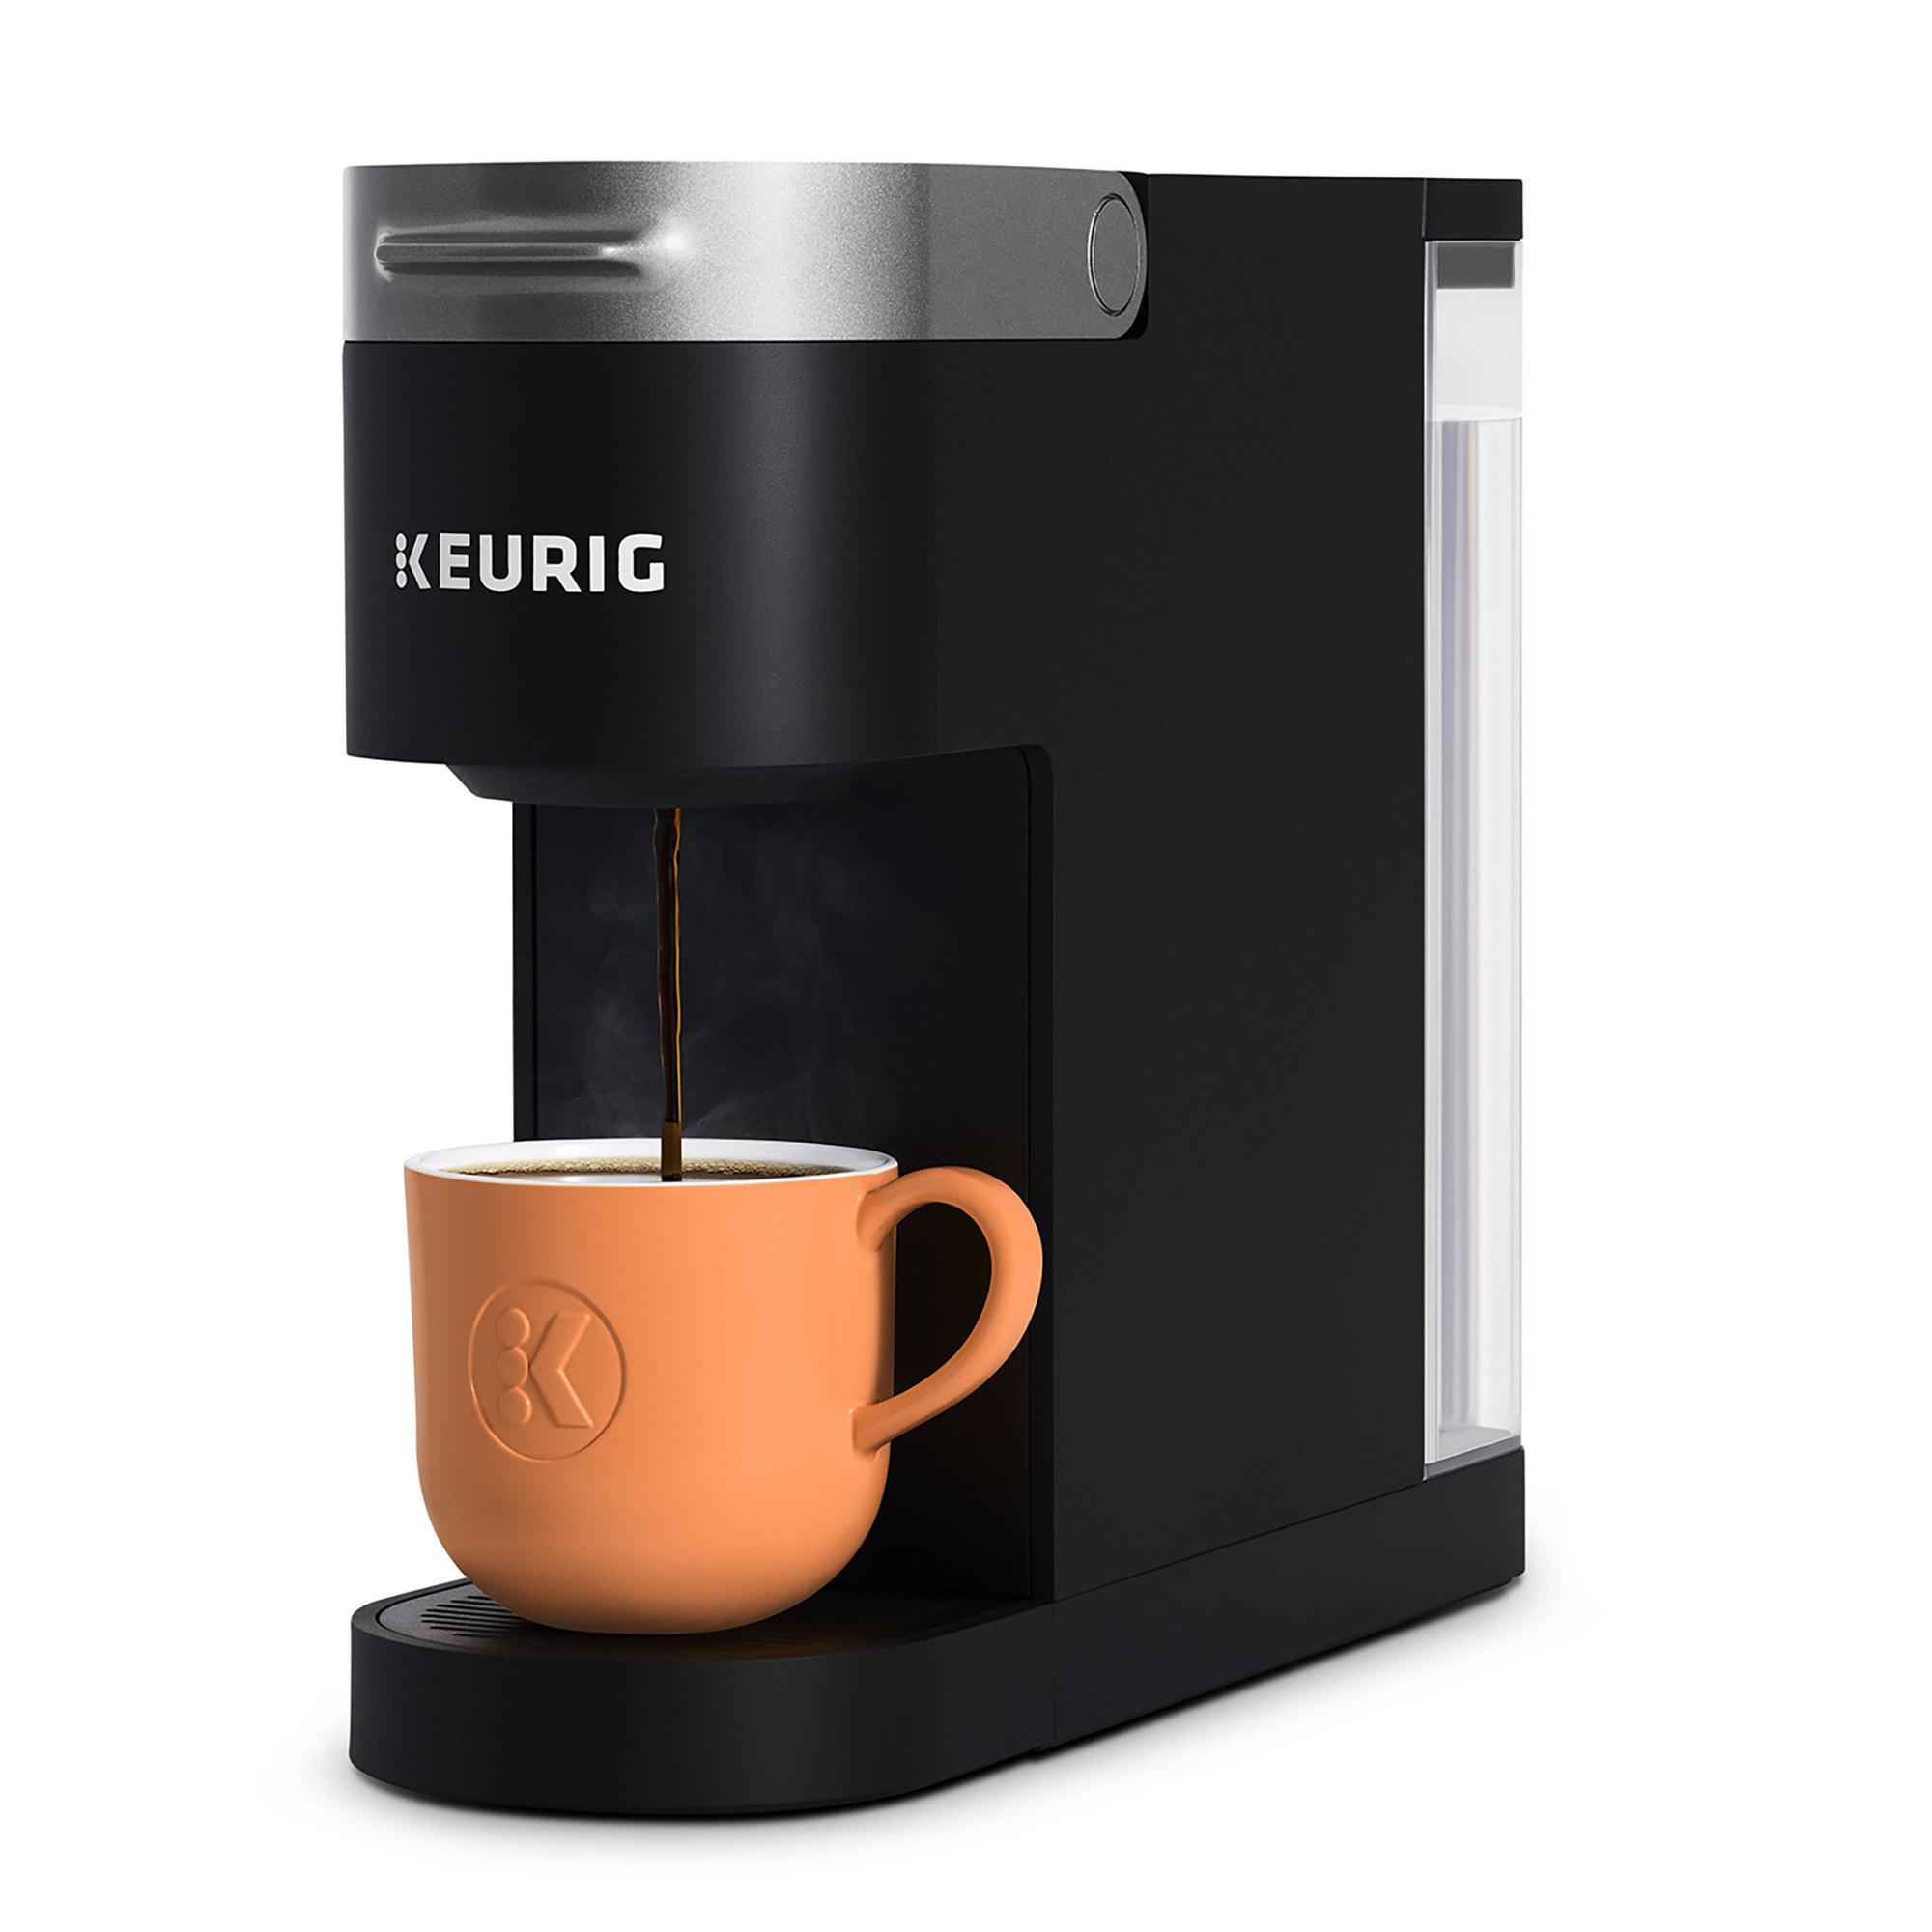 keurig coffee maker pouring coffee into an orange coffee mug